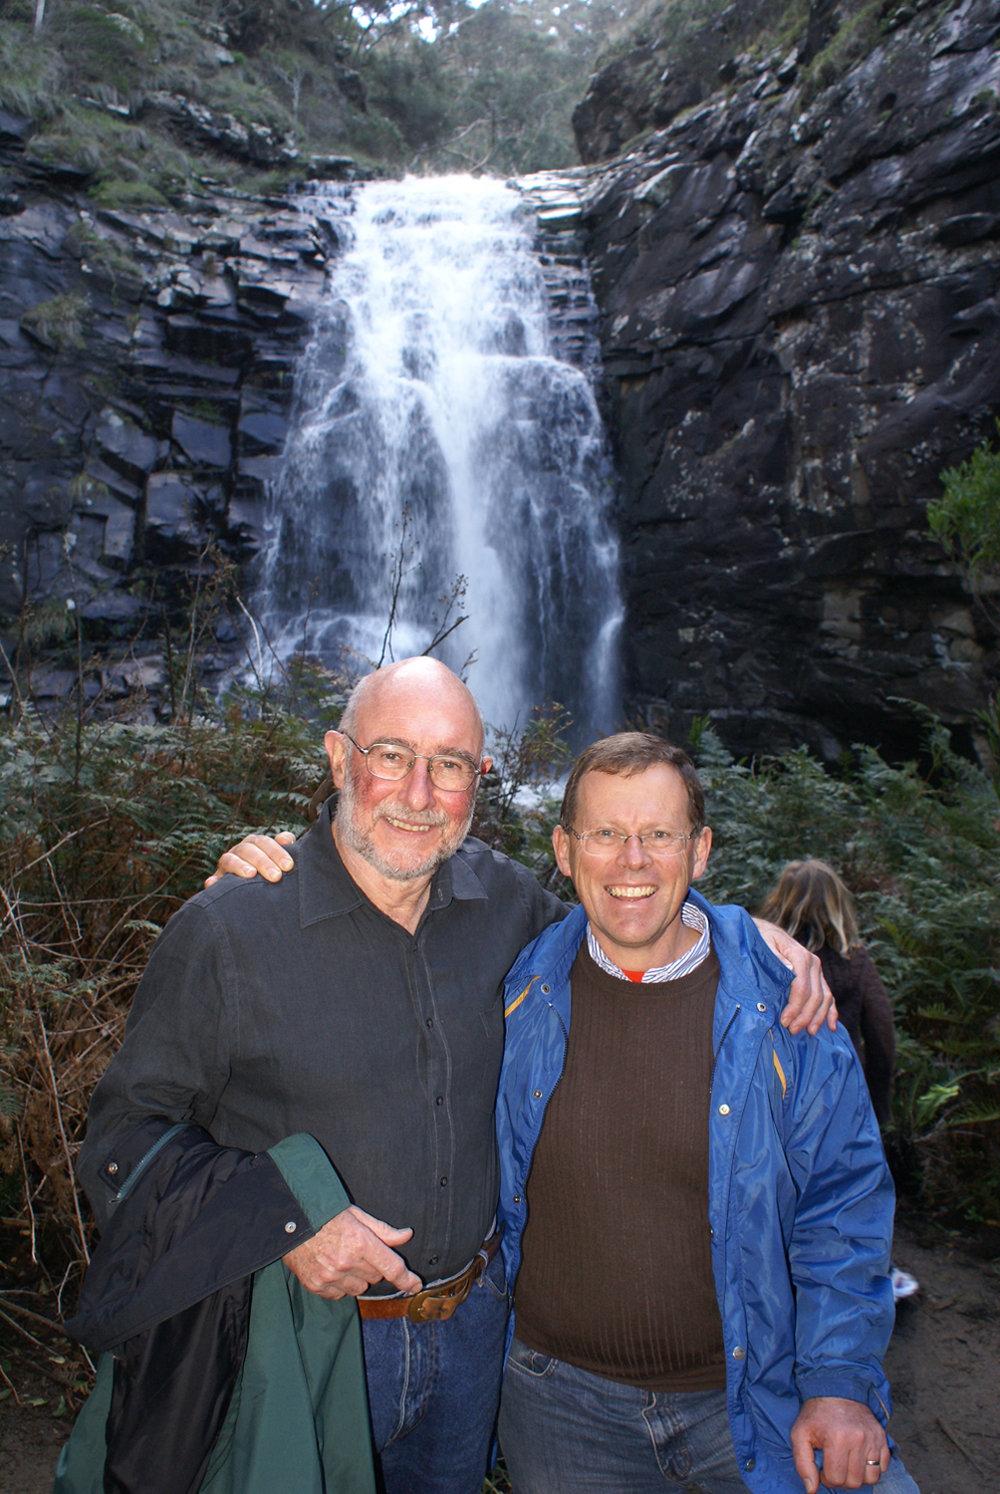 Dexter and Rob Shepherd at Sheoak Falls